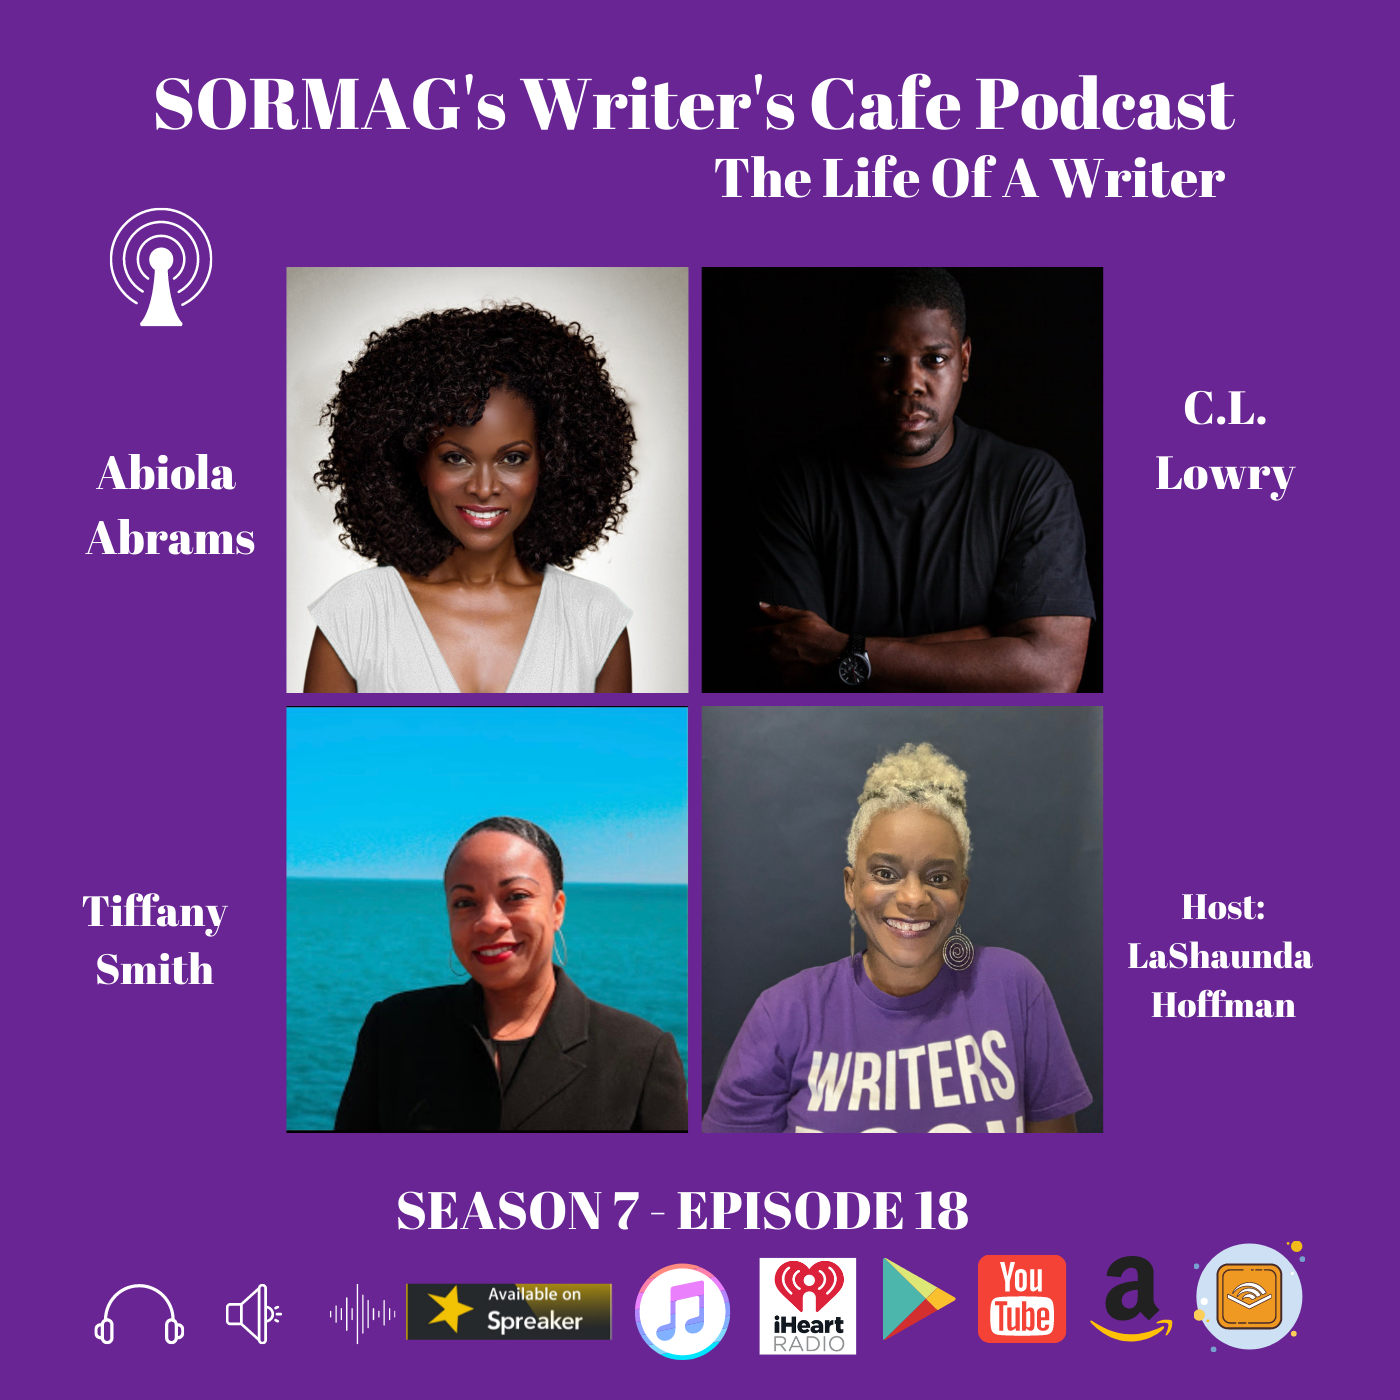 SORMAG's Writer's Café Podcast: Meet Abiola Abrams, C.L. Lowry, Tiffany Smith [Audio]